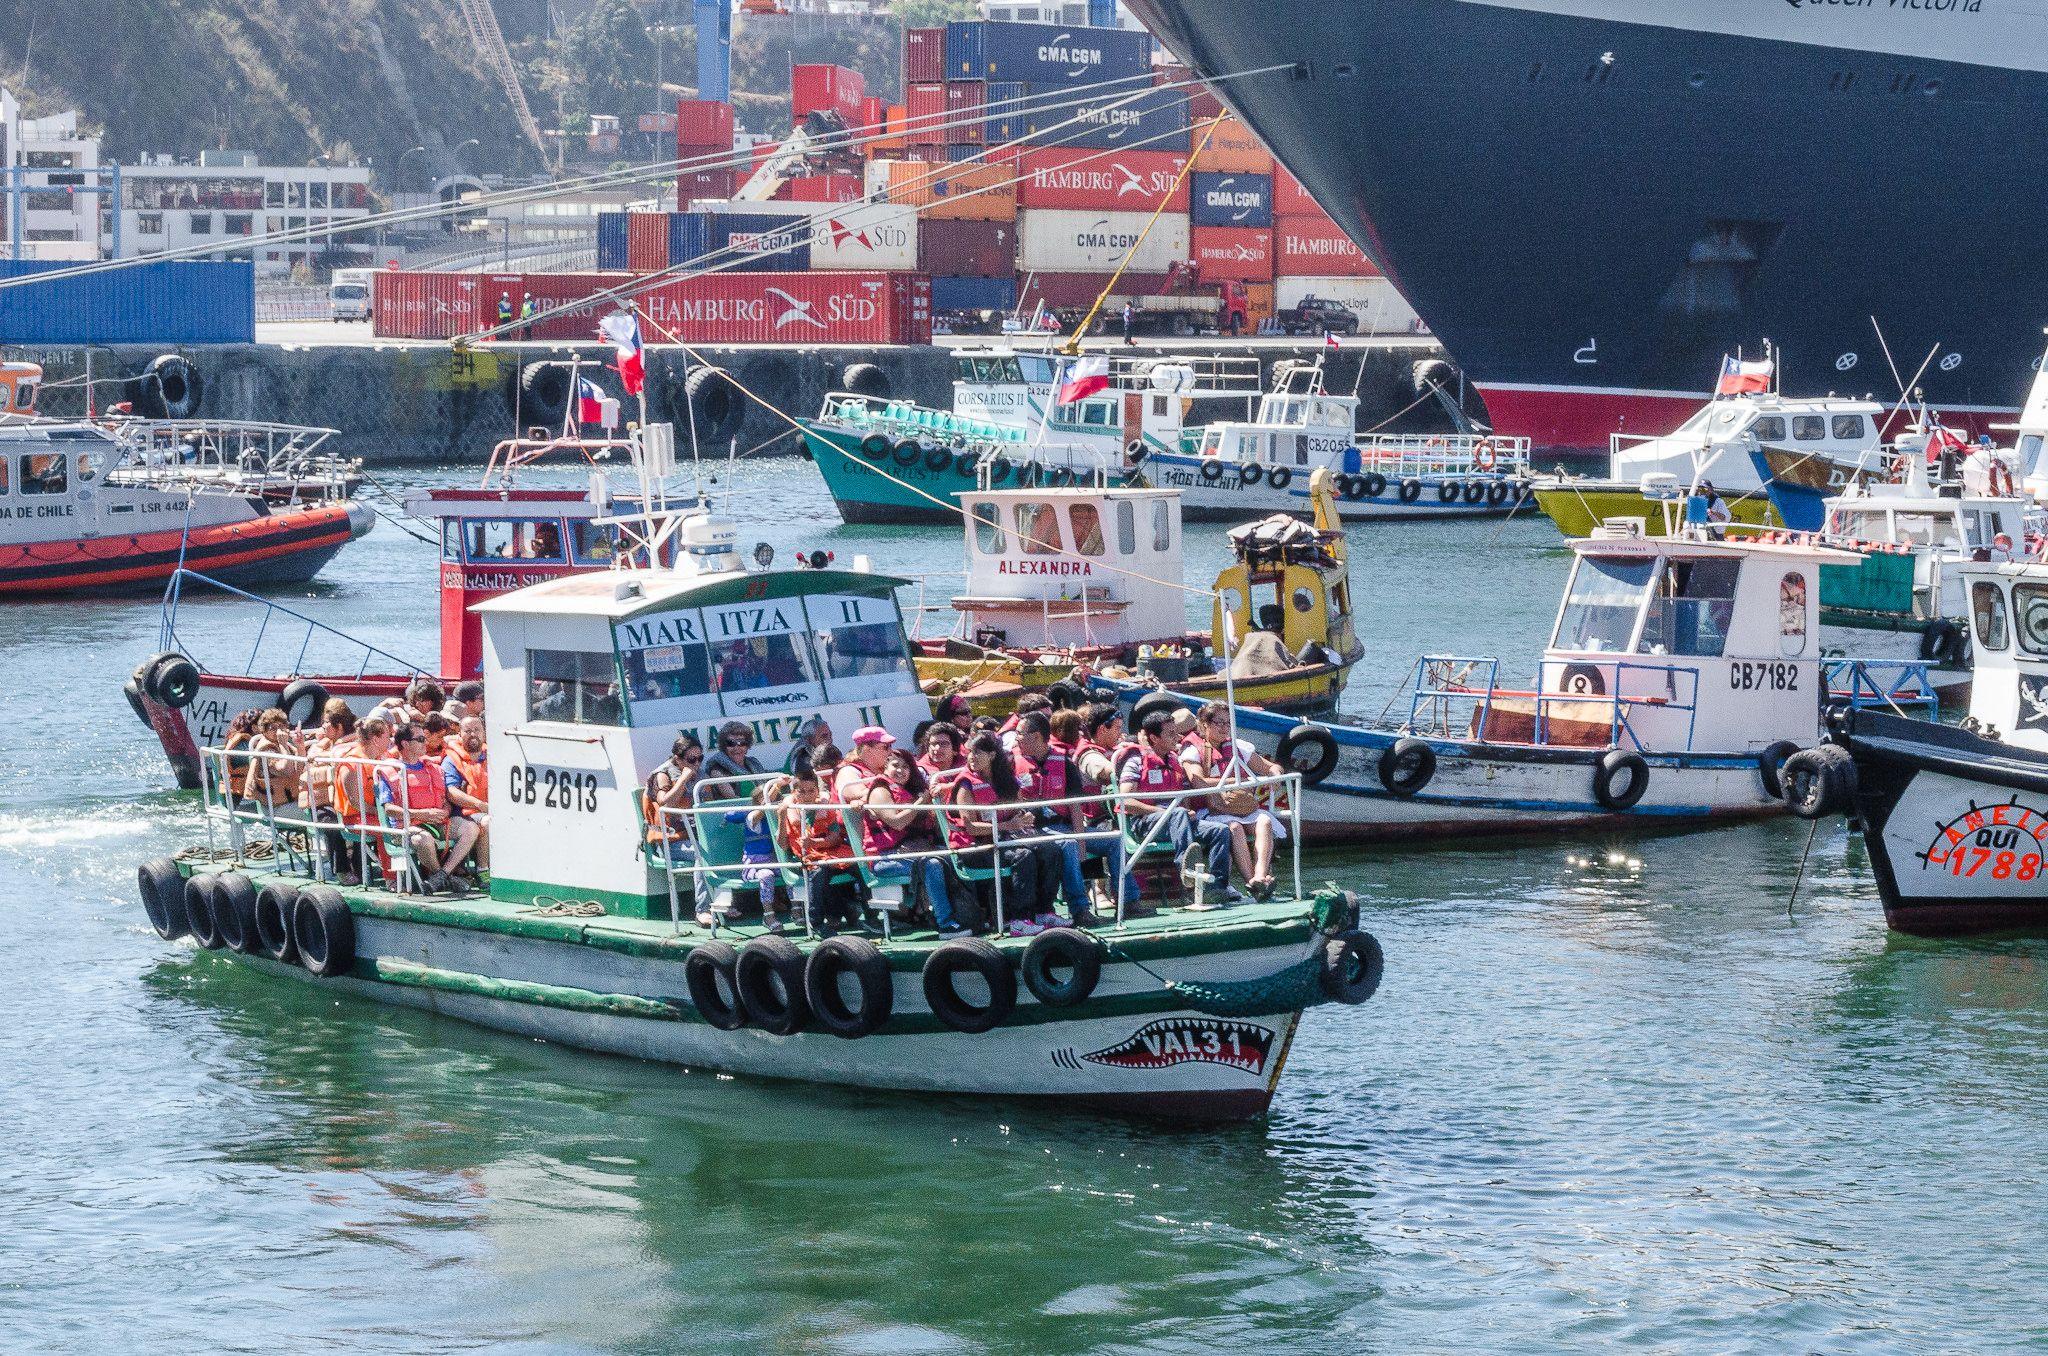 https://flic.kr/p/wMTDnD | Valparaíso | Puerto de Valparaíso